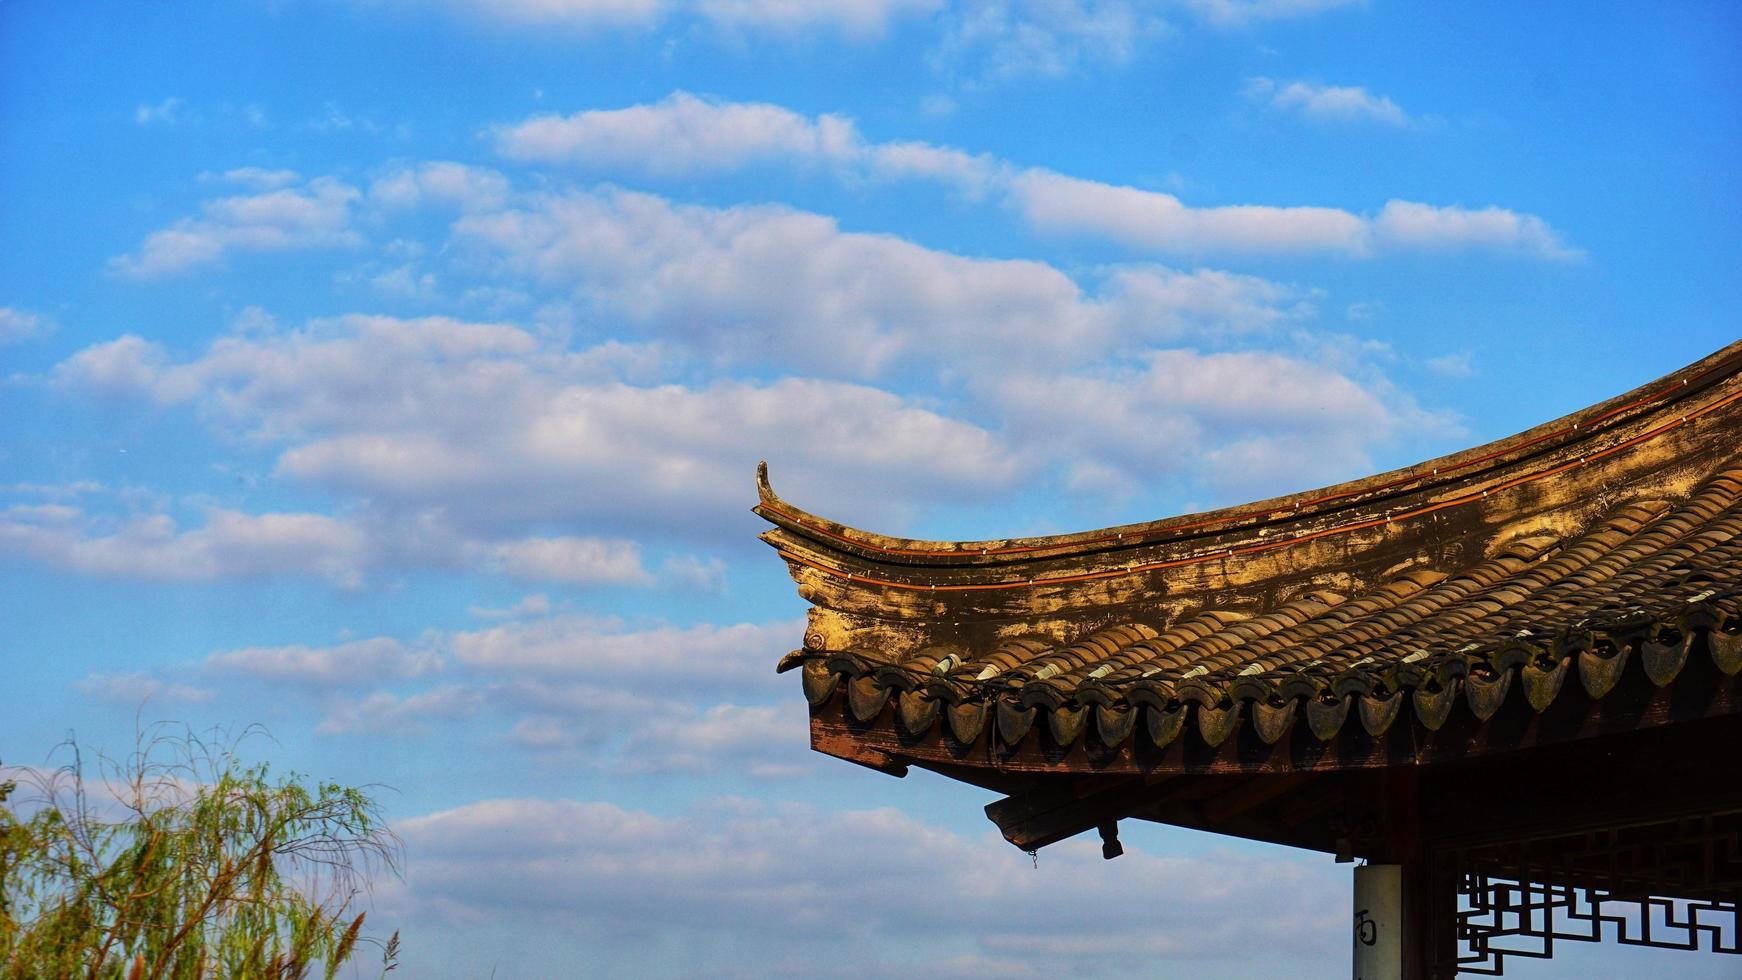 Changshu Stadt, Provinz Jiangsu. 25. Oktober 2020 - blauer Himmel und Traufe foto